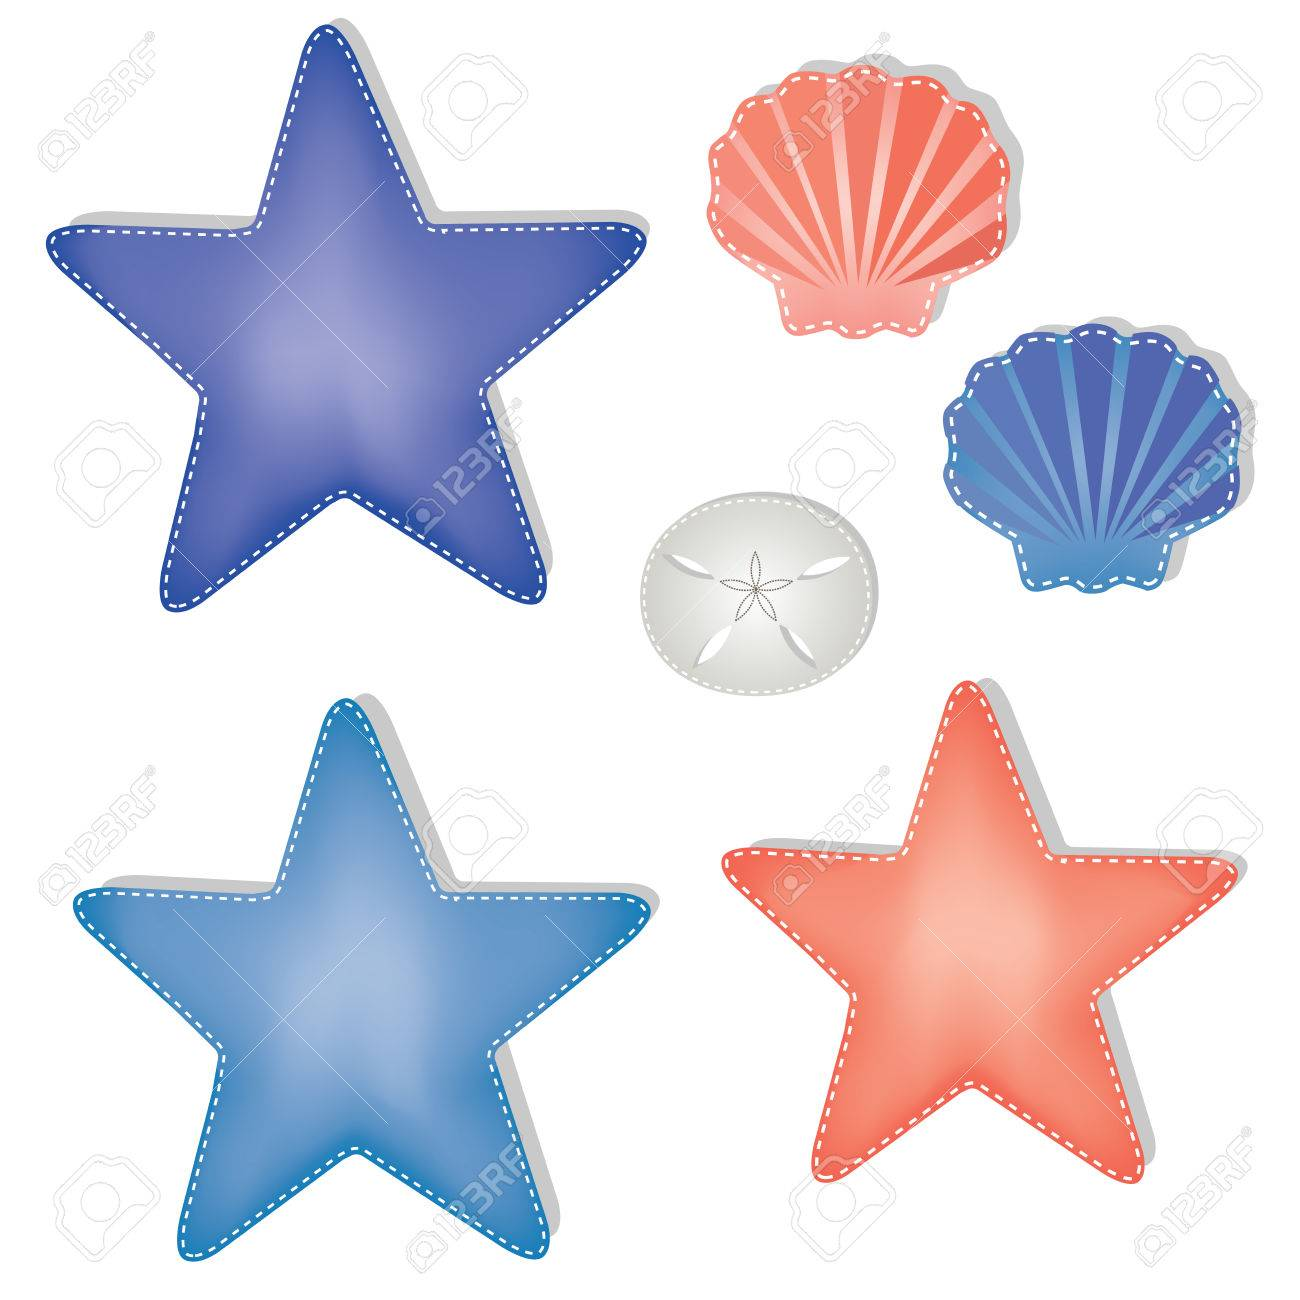 sea shells and starfish on a transparent background scrapbooking rh 123rf com